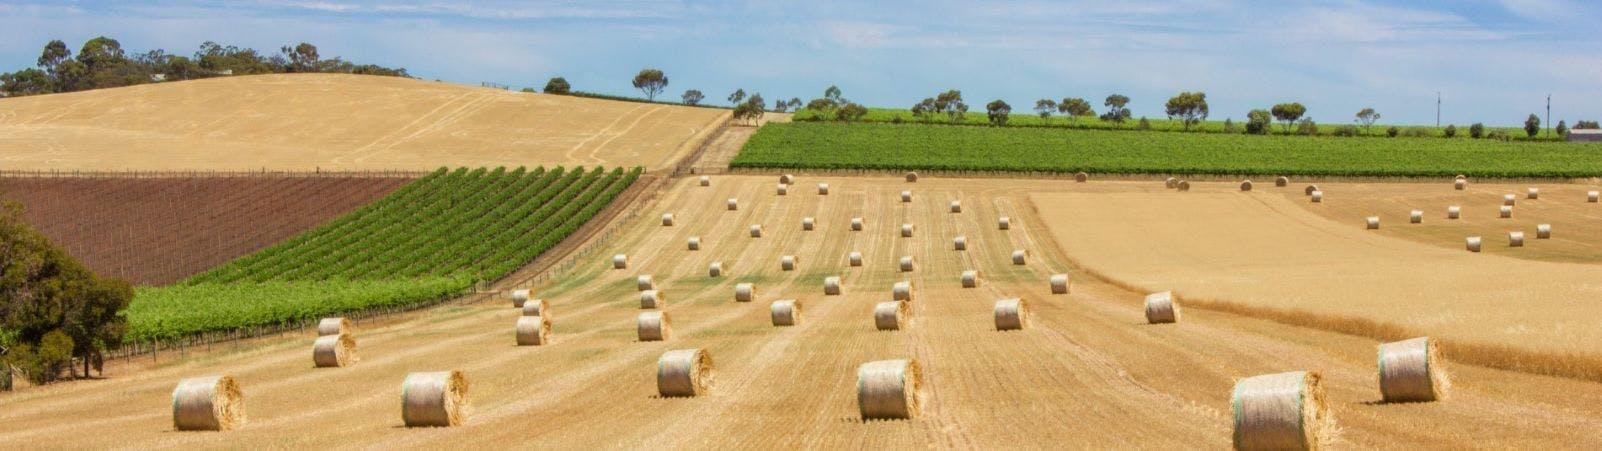 Grape vines meet wheat fields